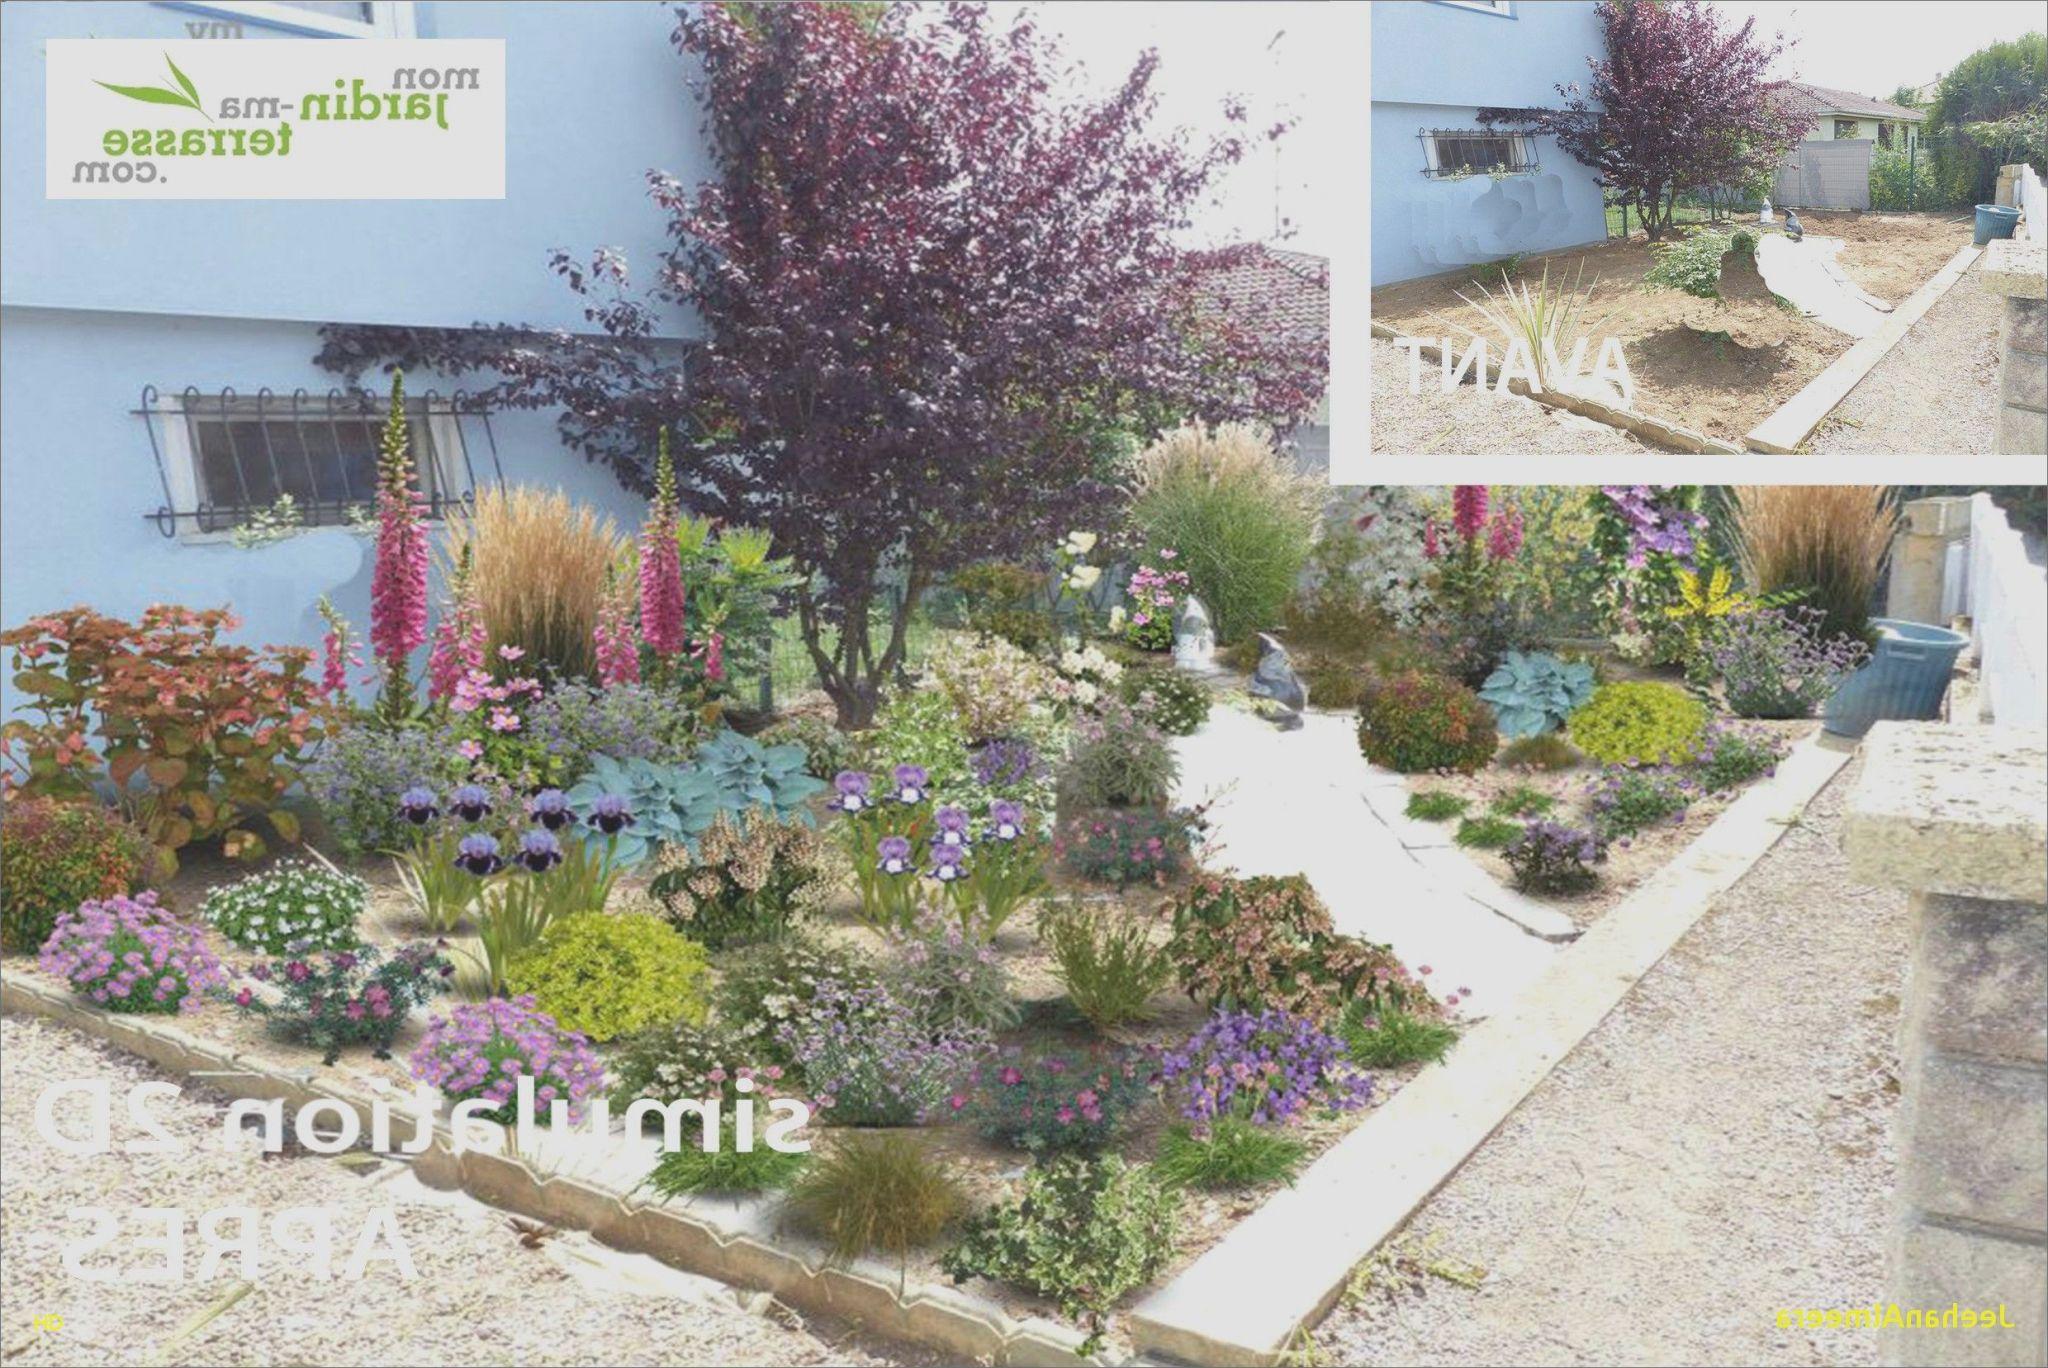 Logiciel Creation Jardin Schème - Idees Conception Jardin pour Logiciel Creation Jardin